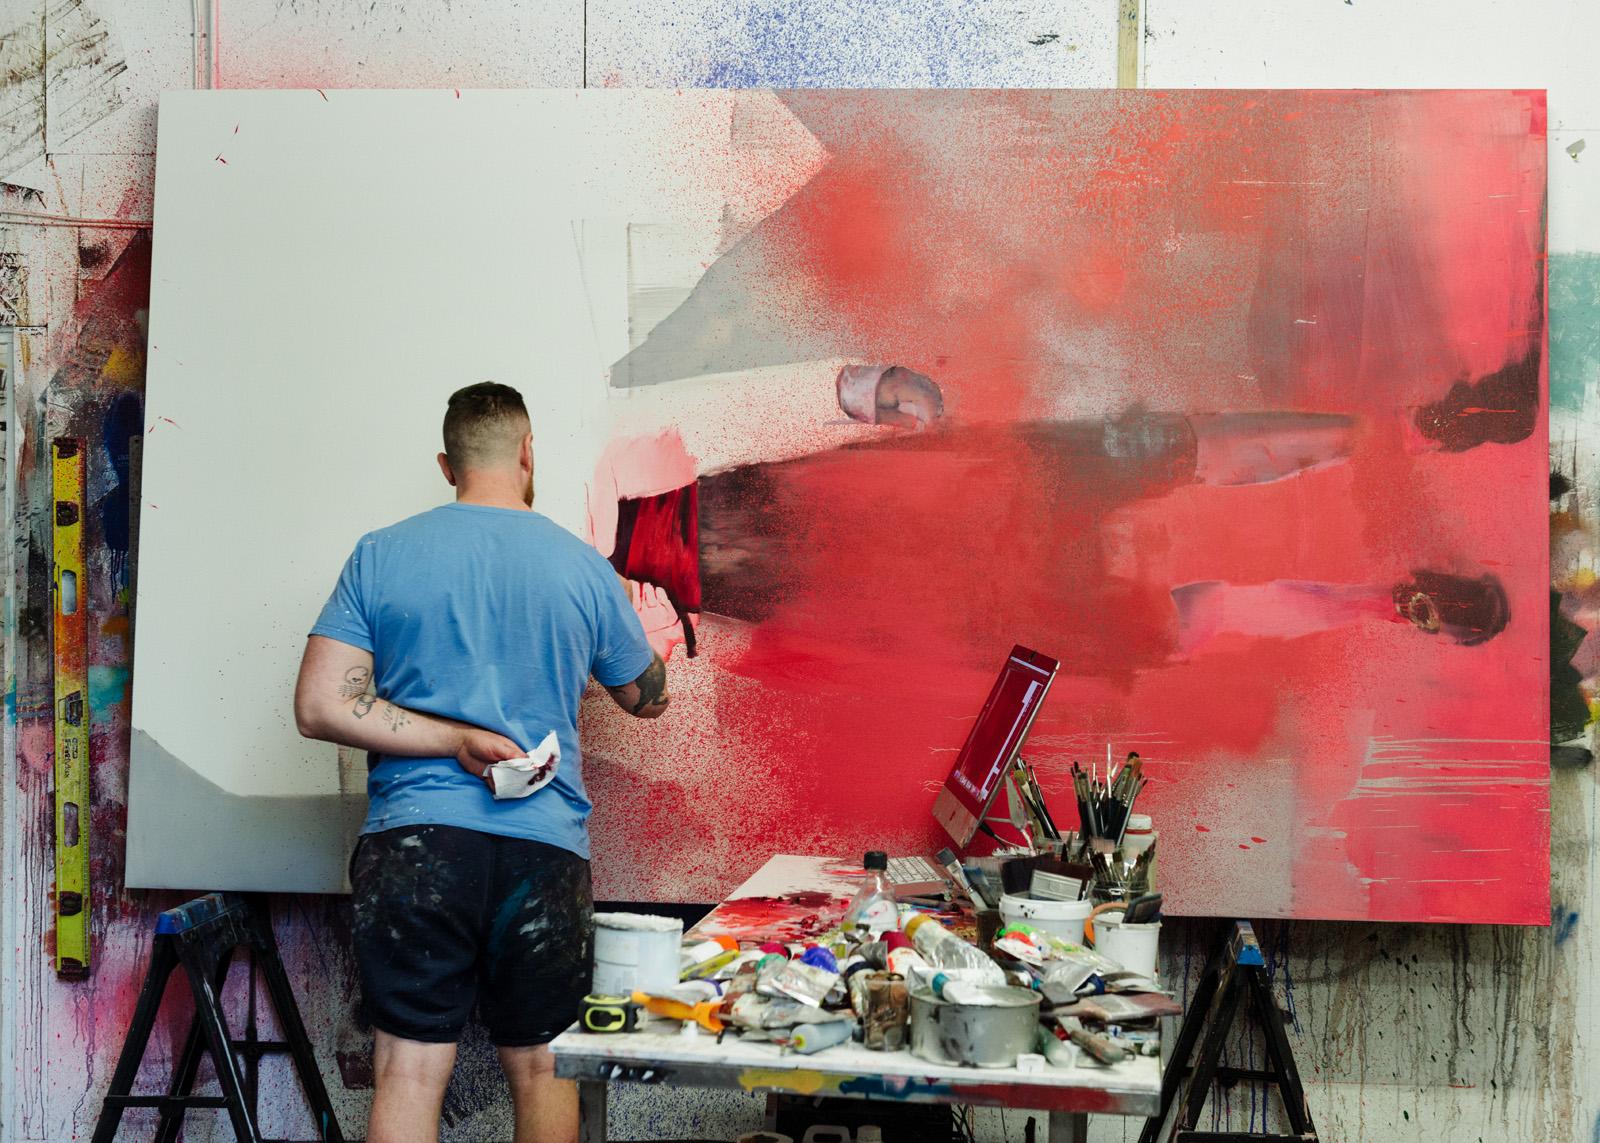 The studio of Irish artist, Conor Harrington